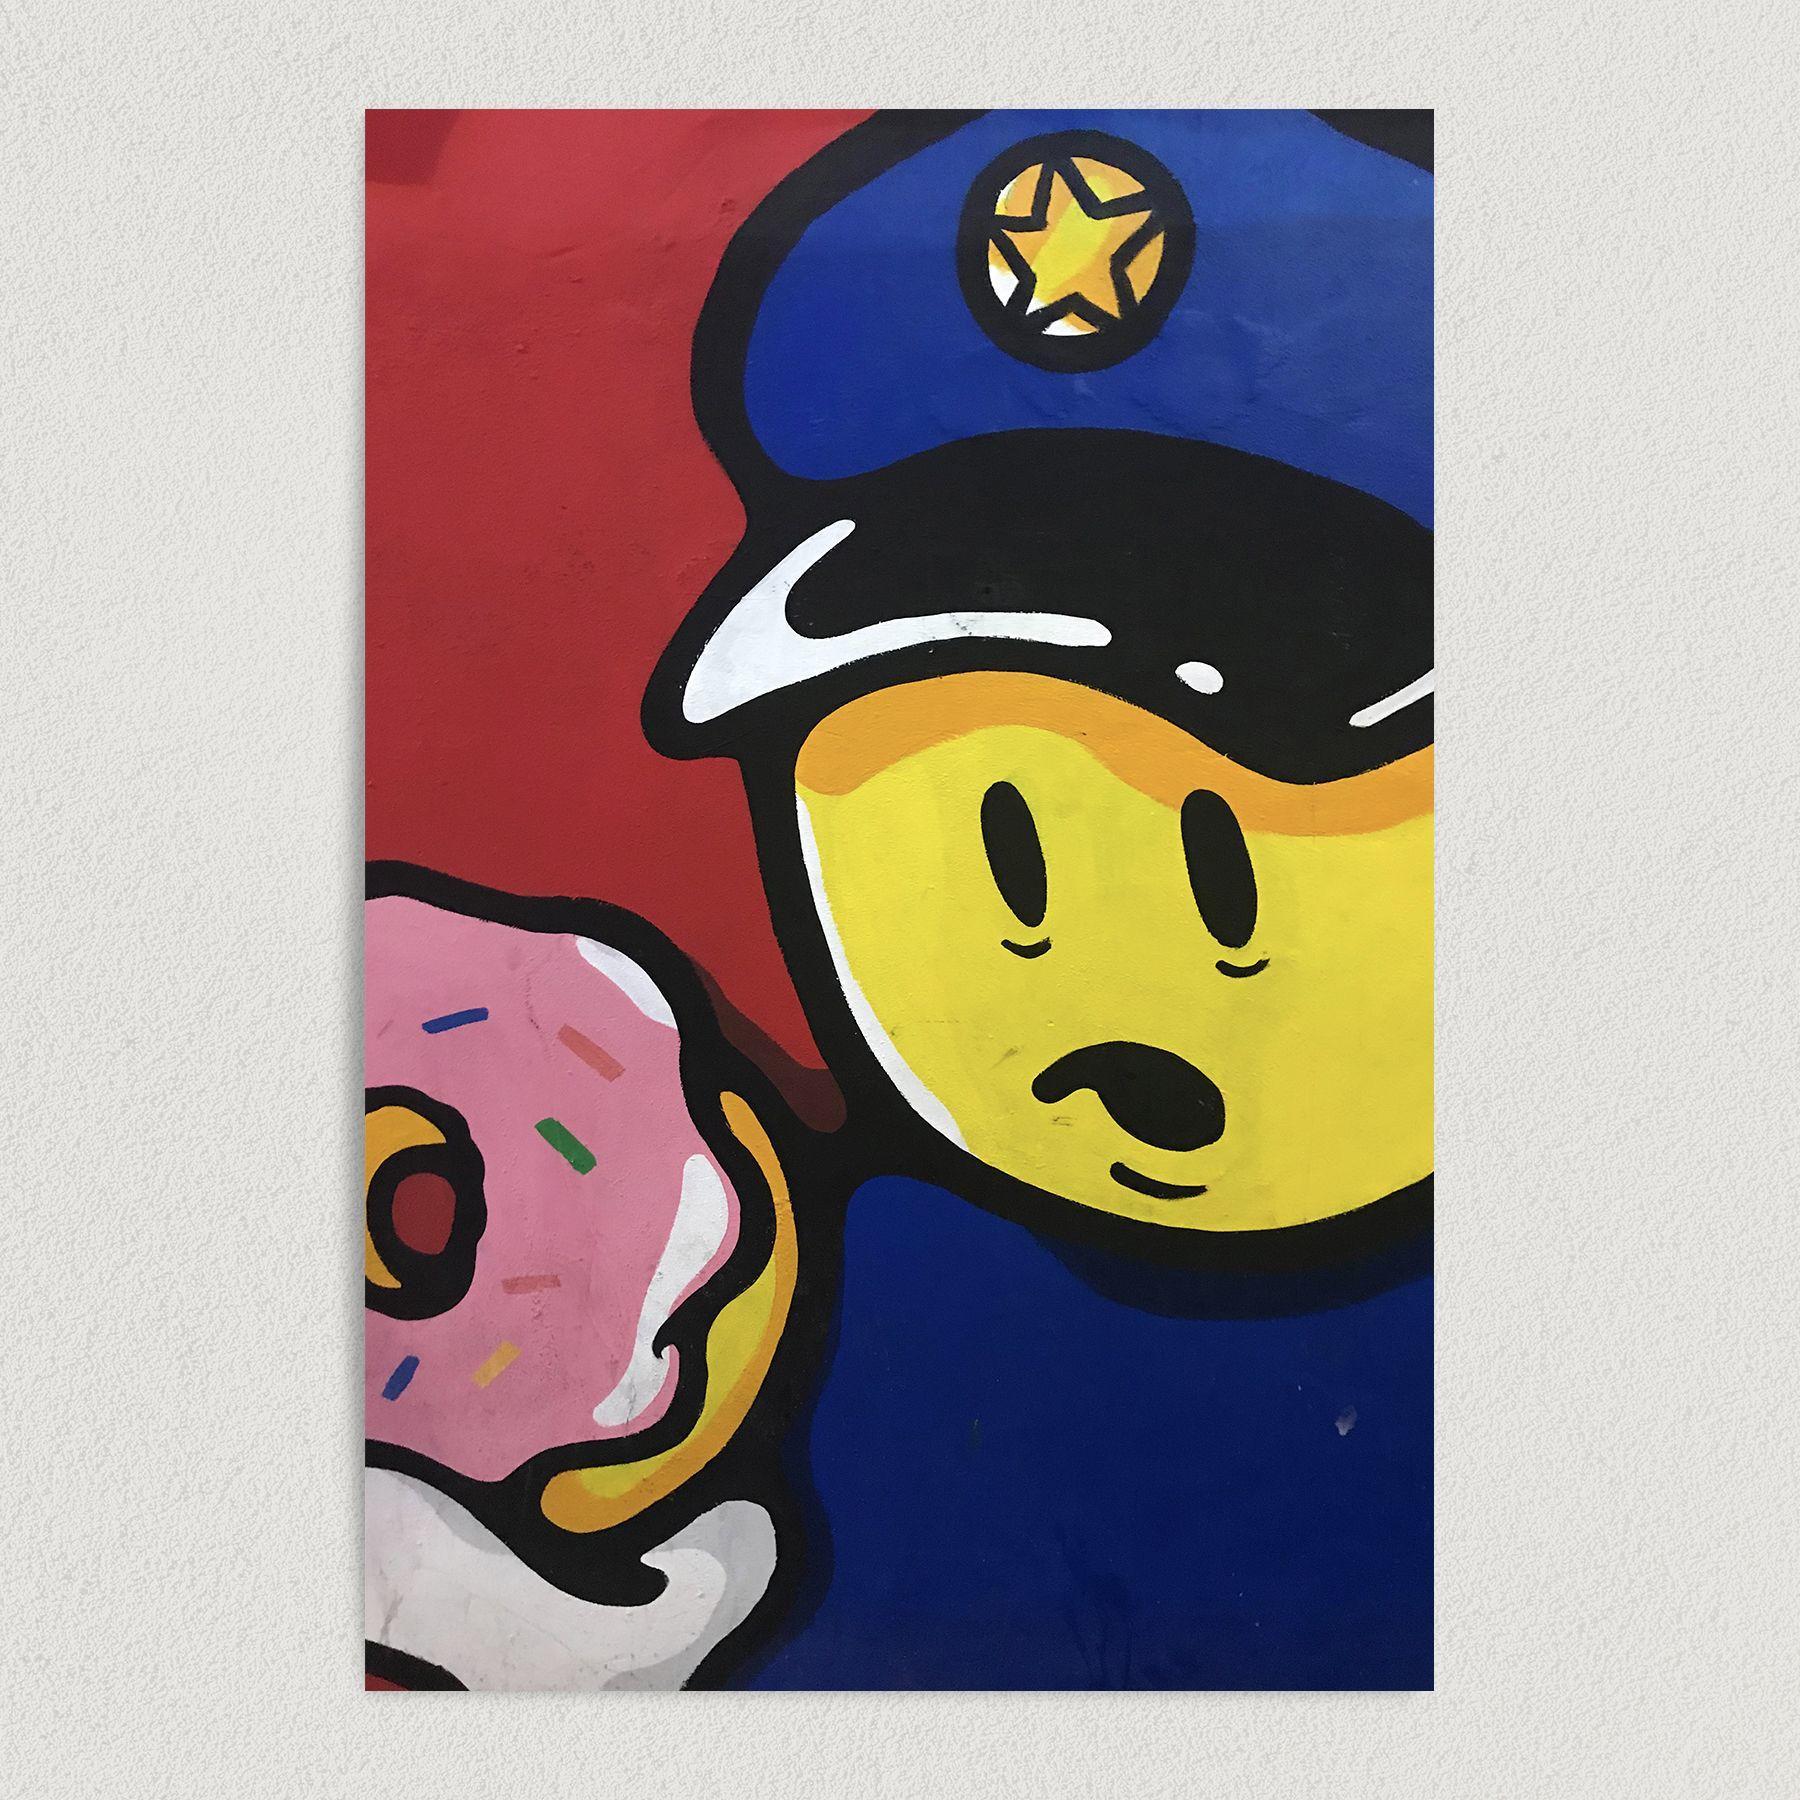 Cop Debates Eating A Donut Art Print Poster G1004